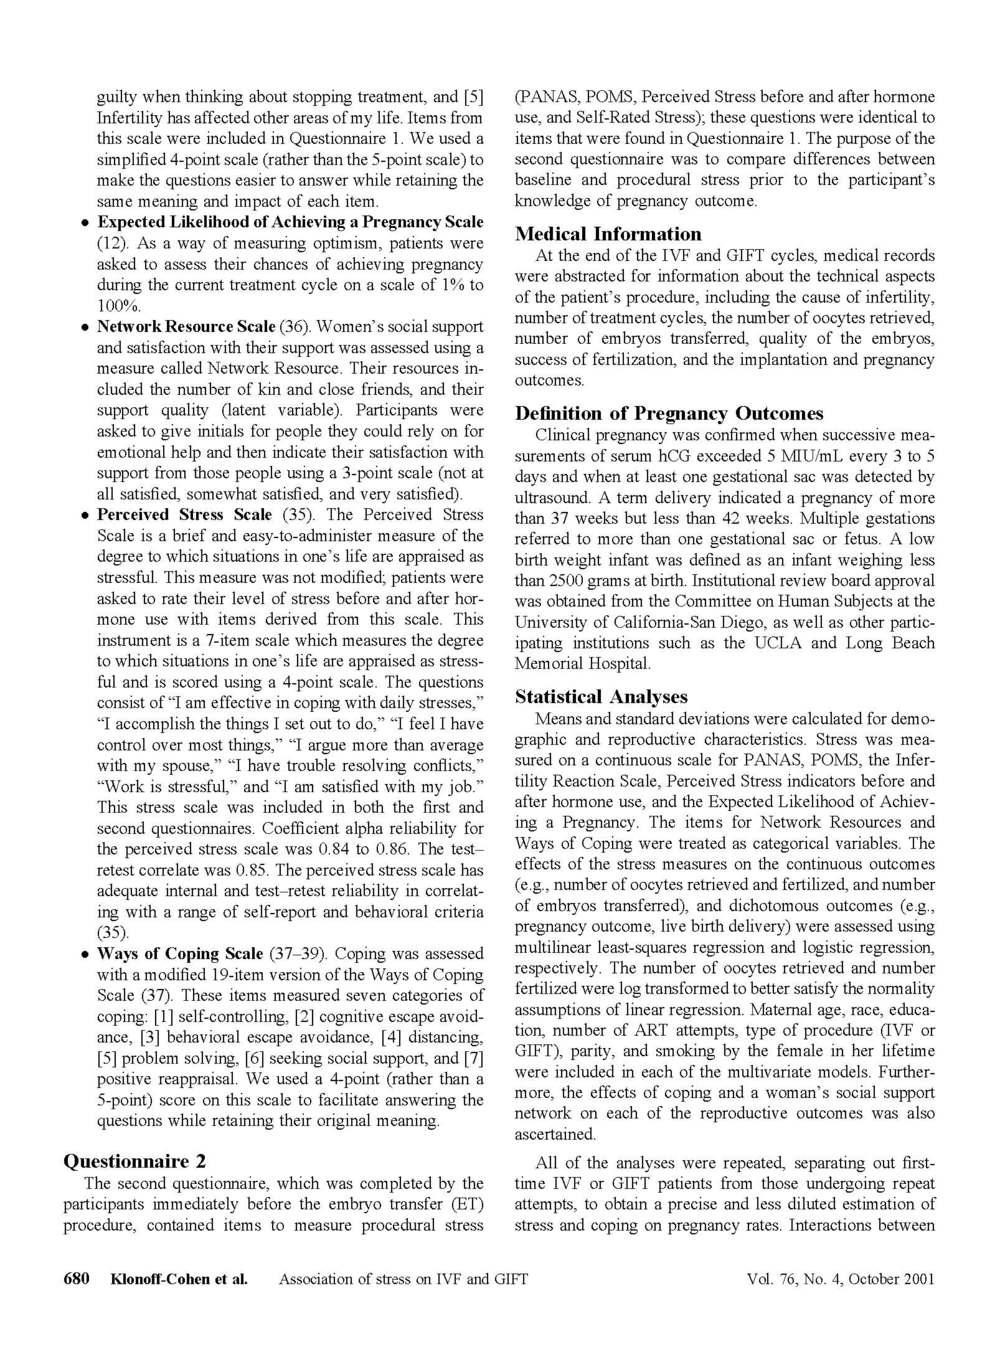 Research_3_pg5.jpg